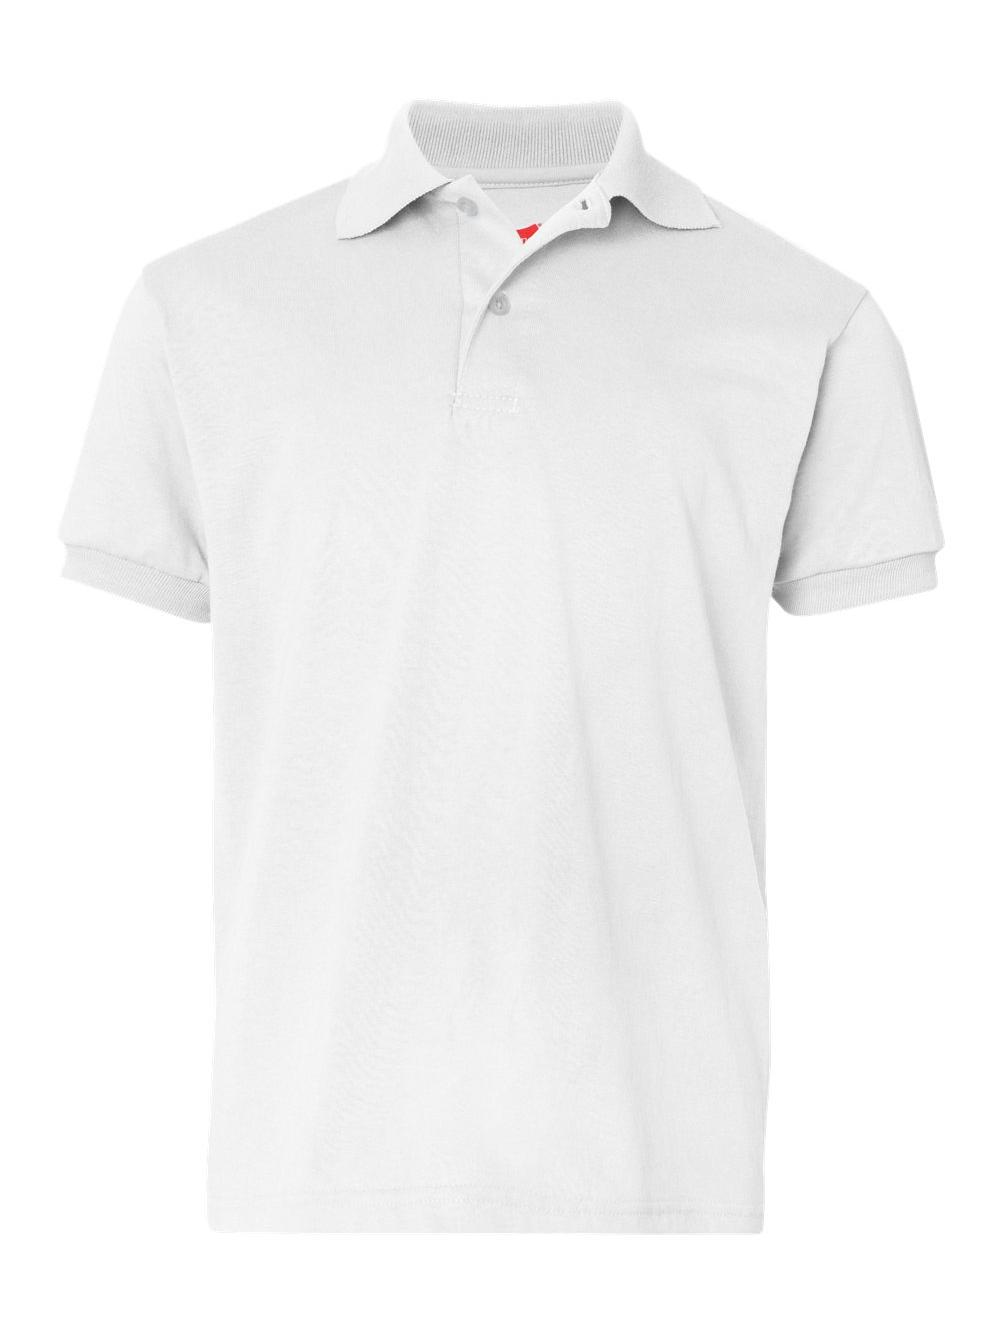 Hanes Sport Shirts Youth Ecosmart® Jersey Sport Shirt